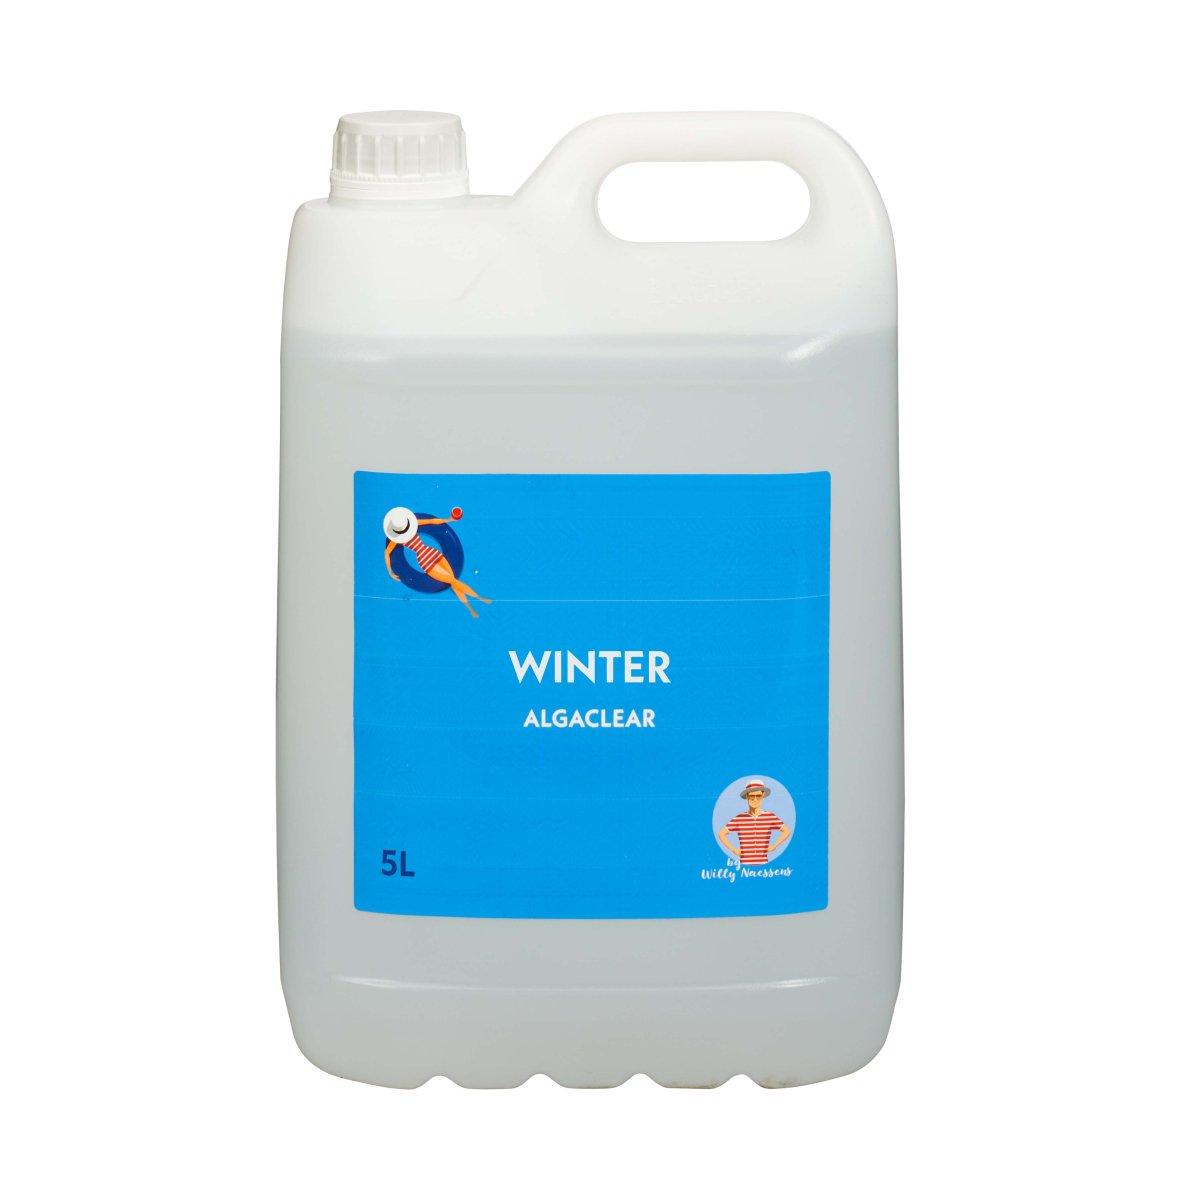 Winterising product 5L